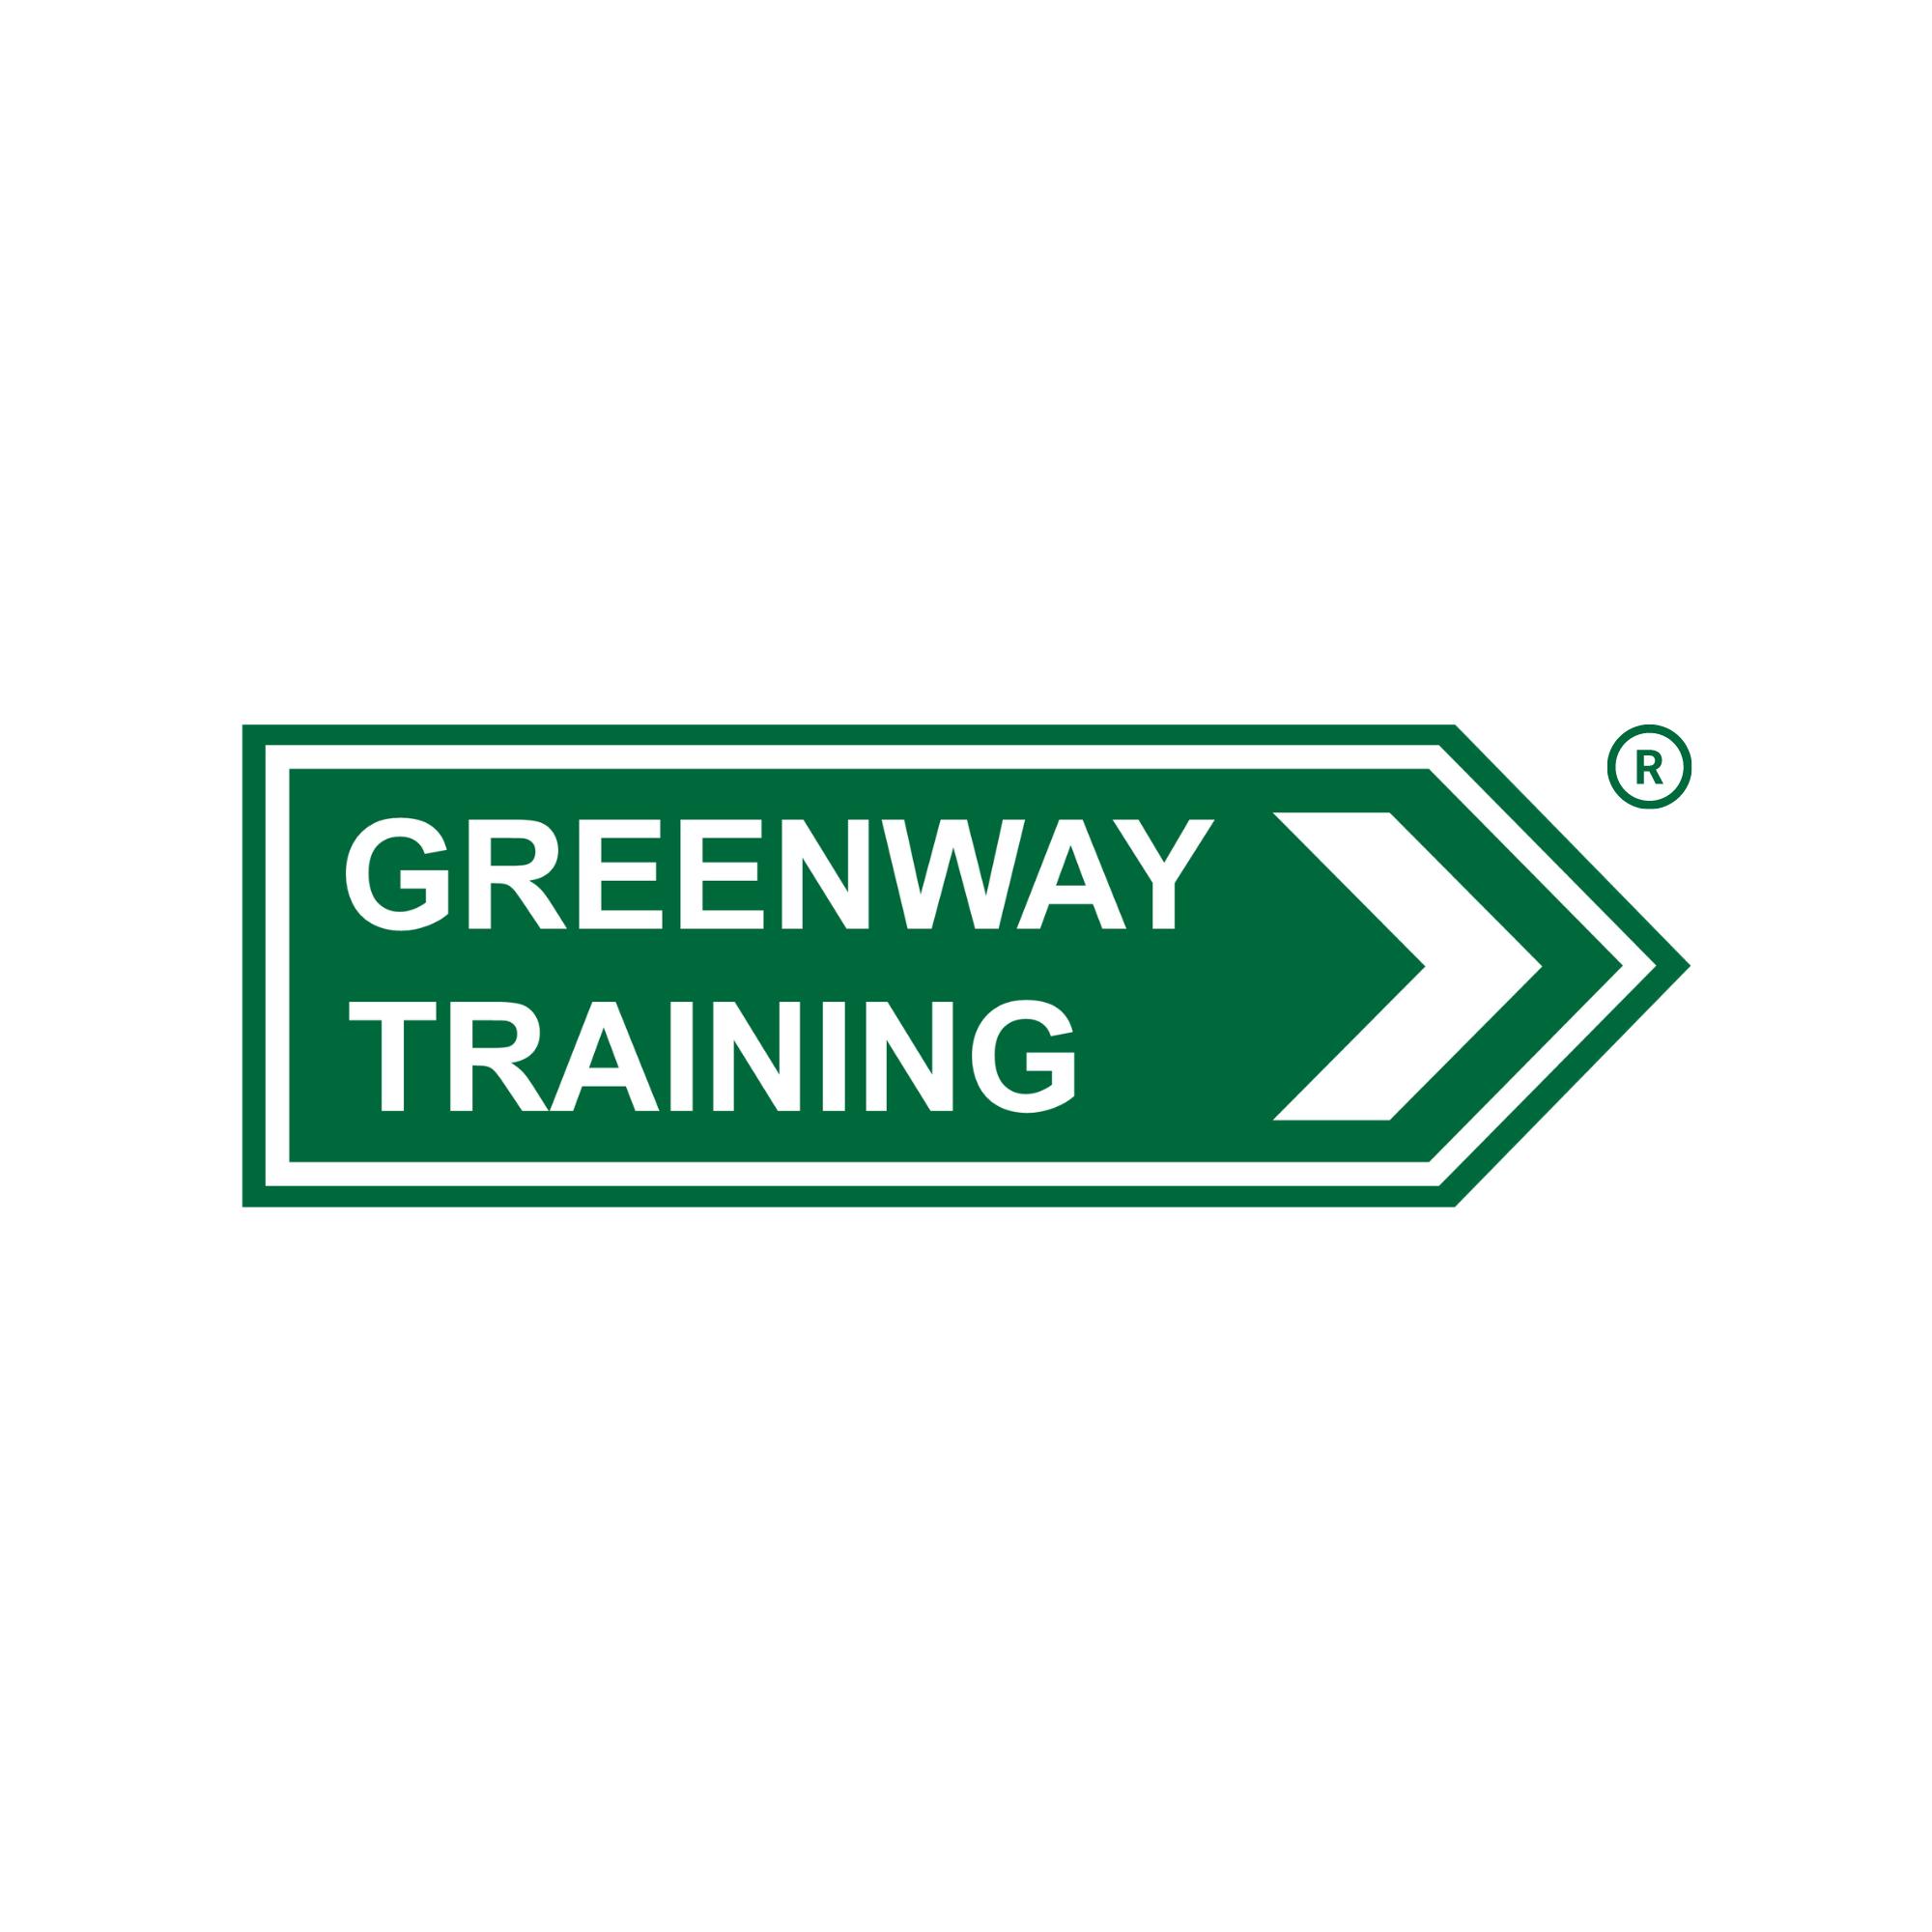 Greenway Training logo